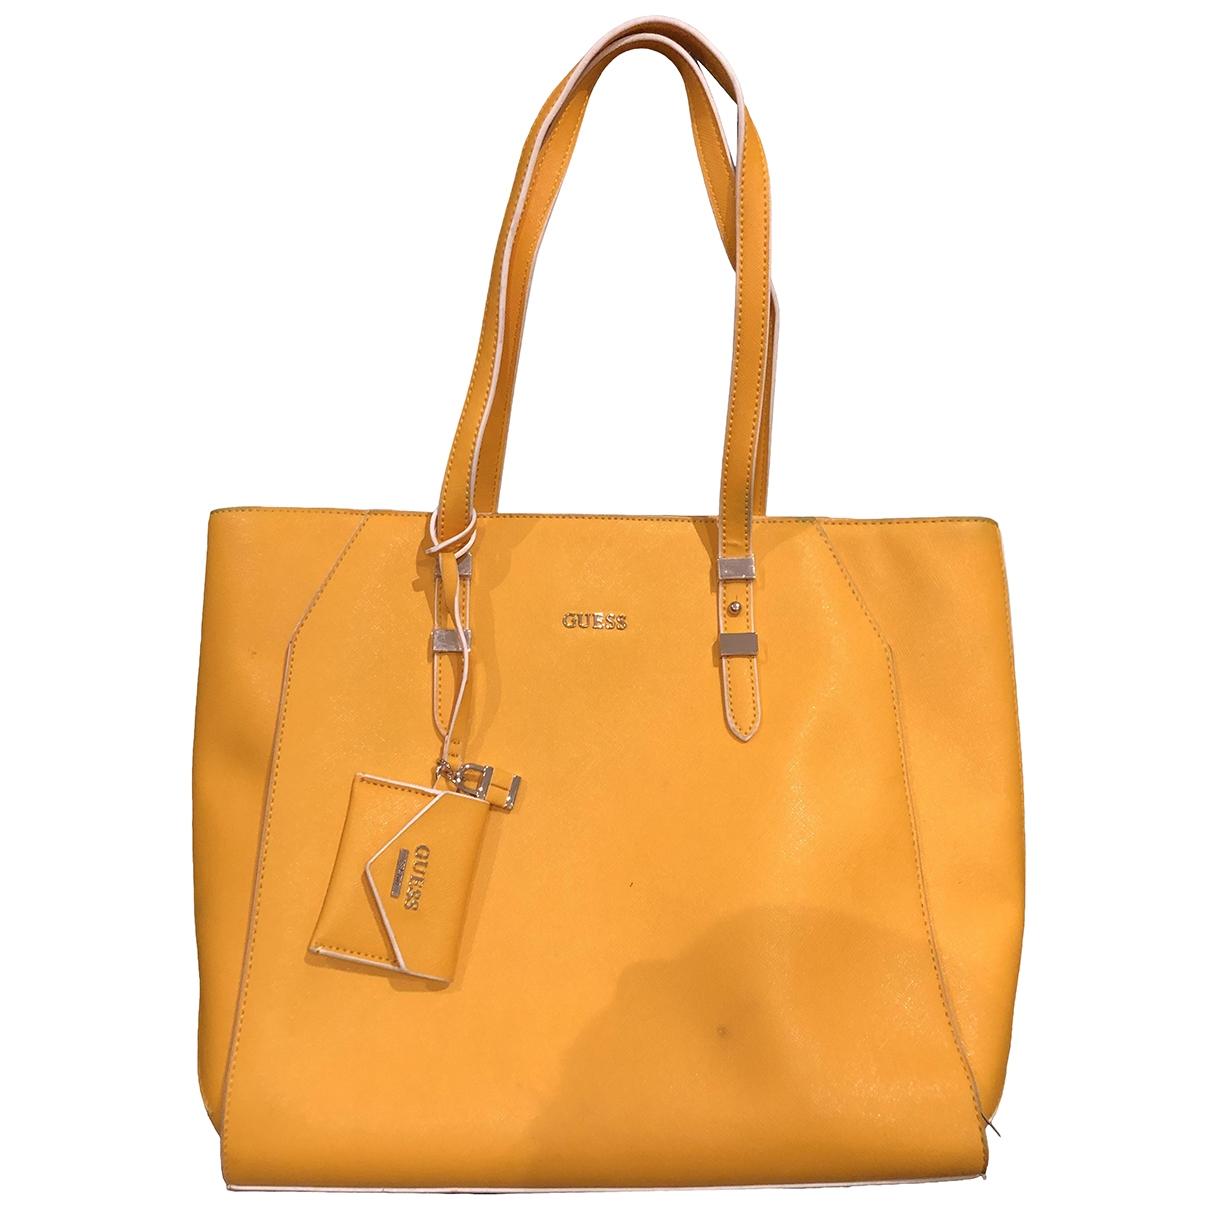 Guess \N Yellow Leather handbag for Women \N